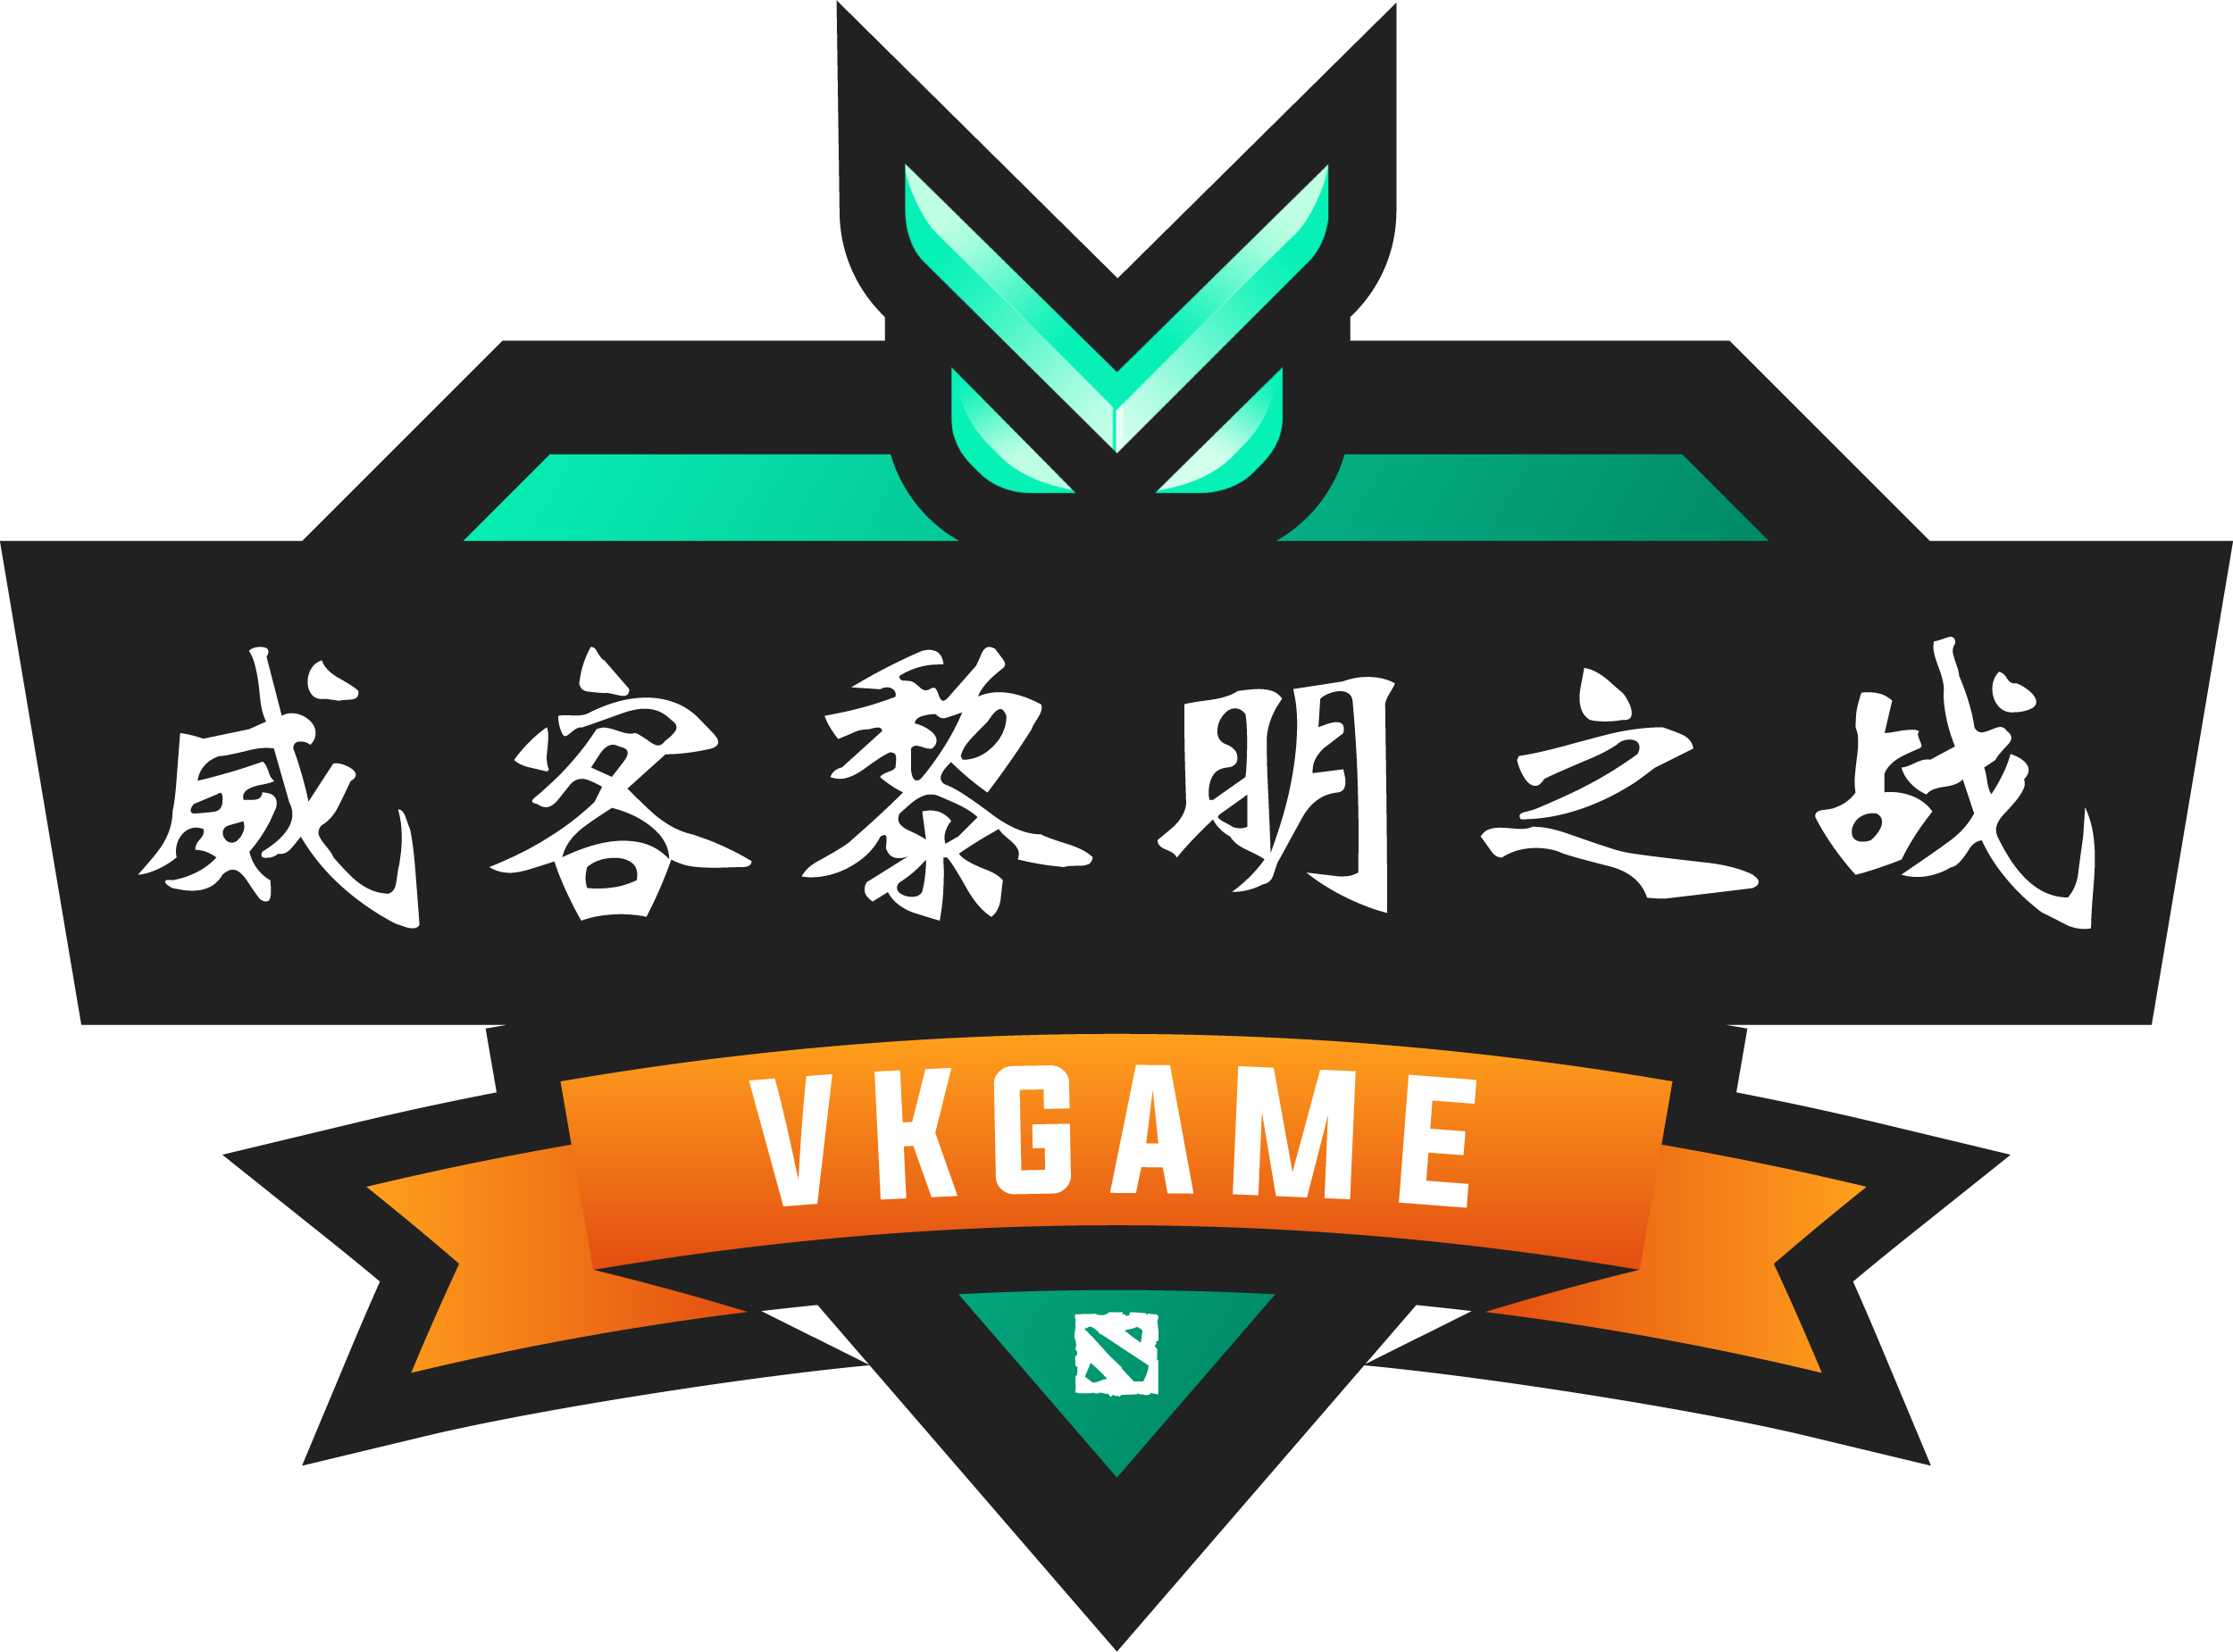 VKGAME BATTLE OF DAWN Season 2019 Tournament